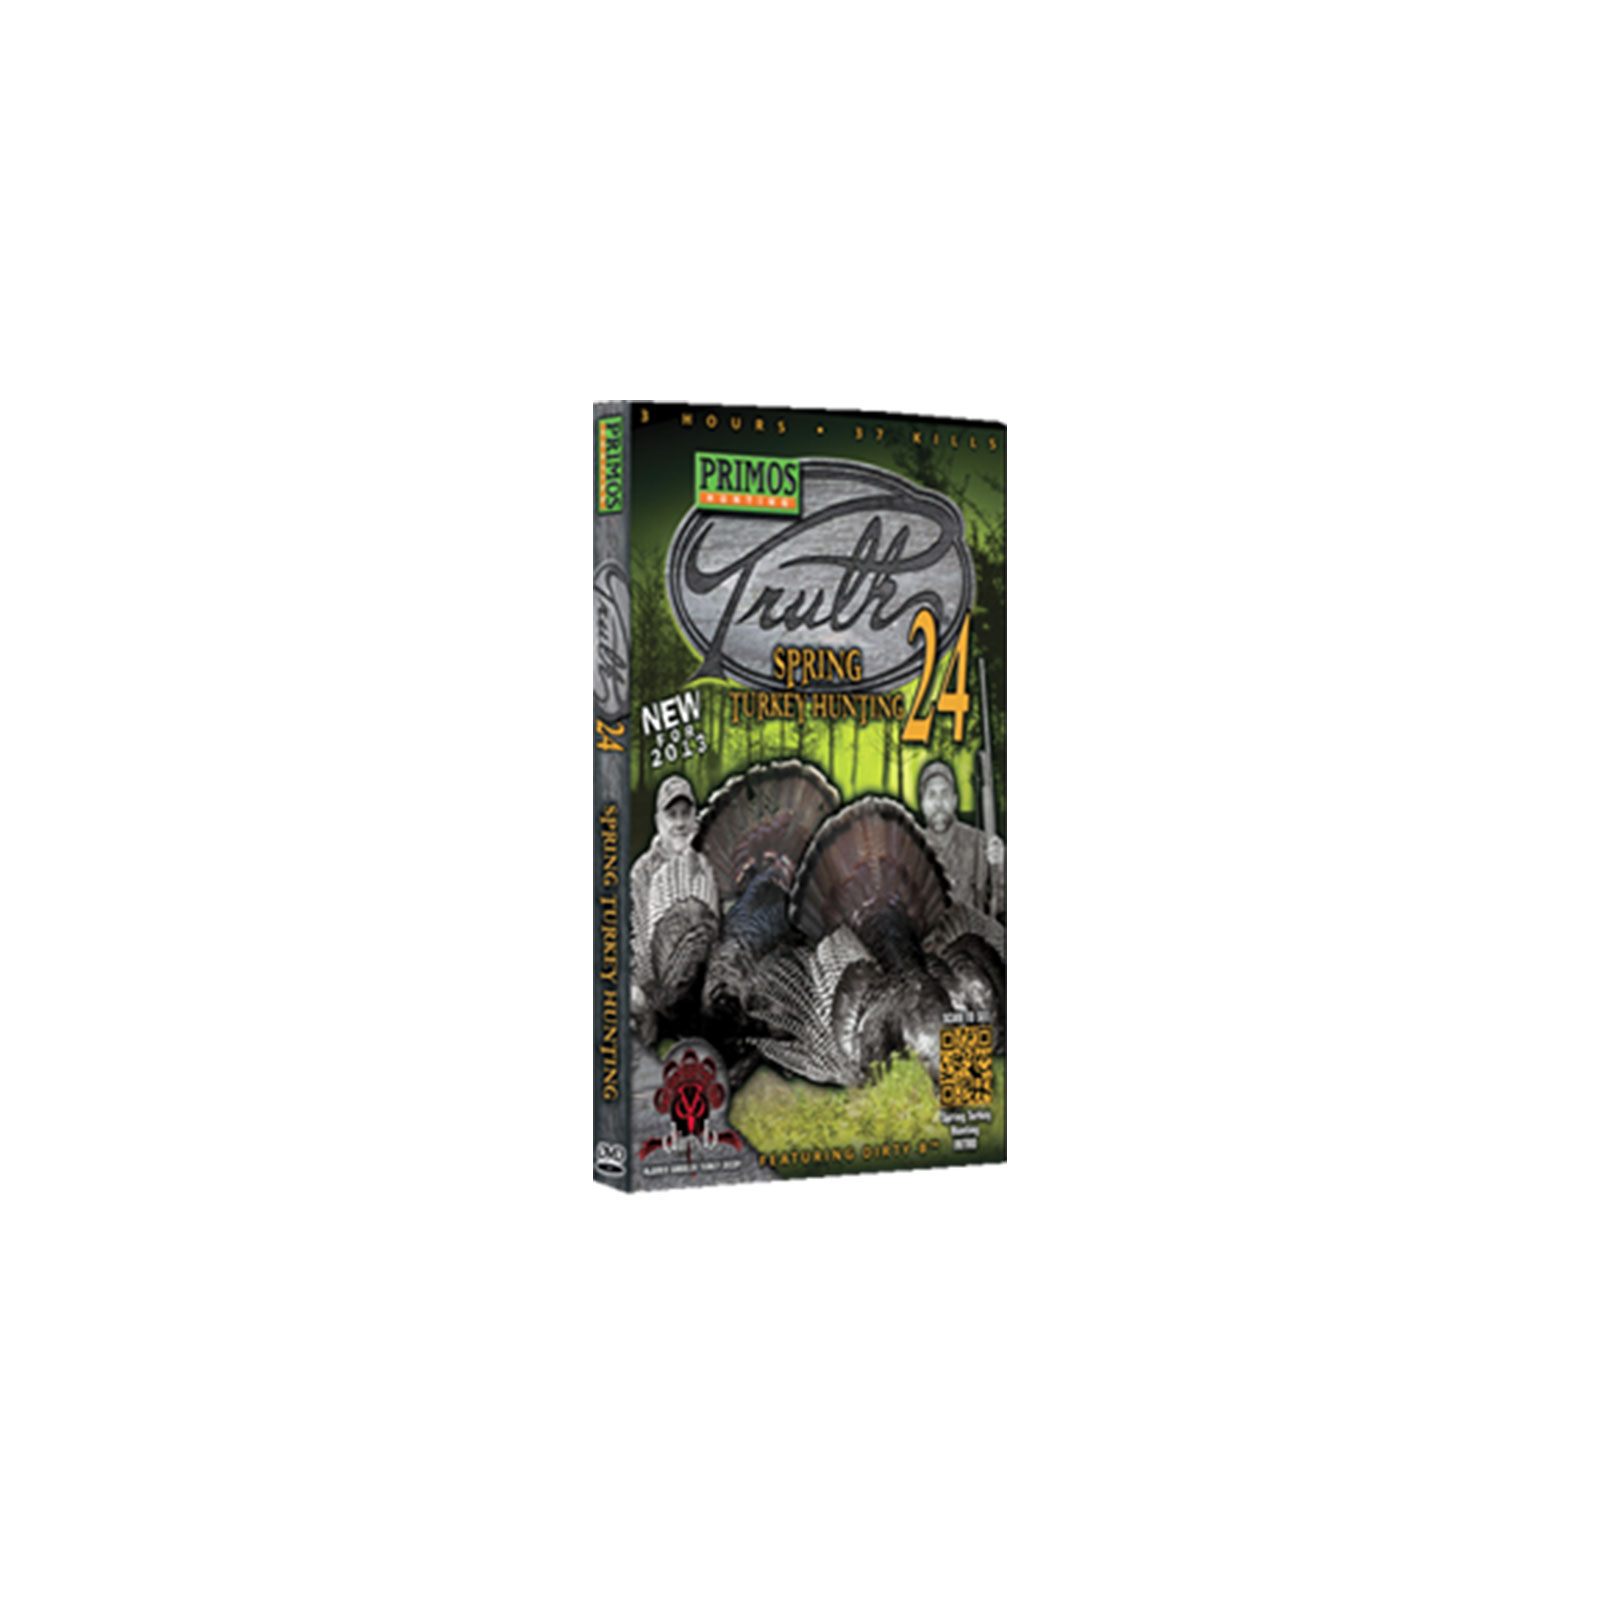 Primos Truth 24 DVD